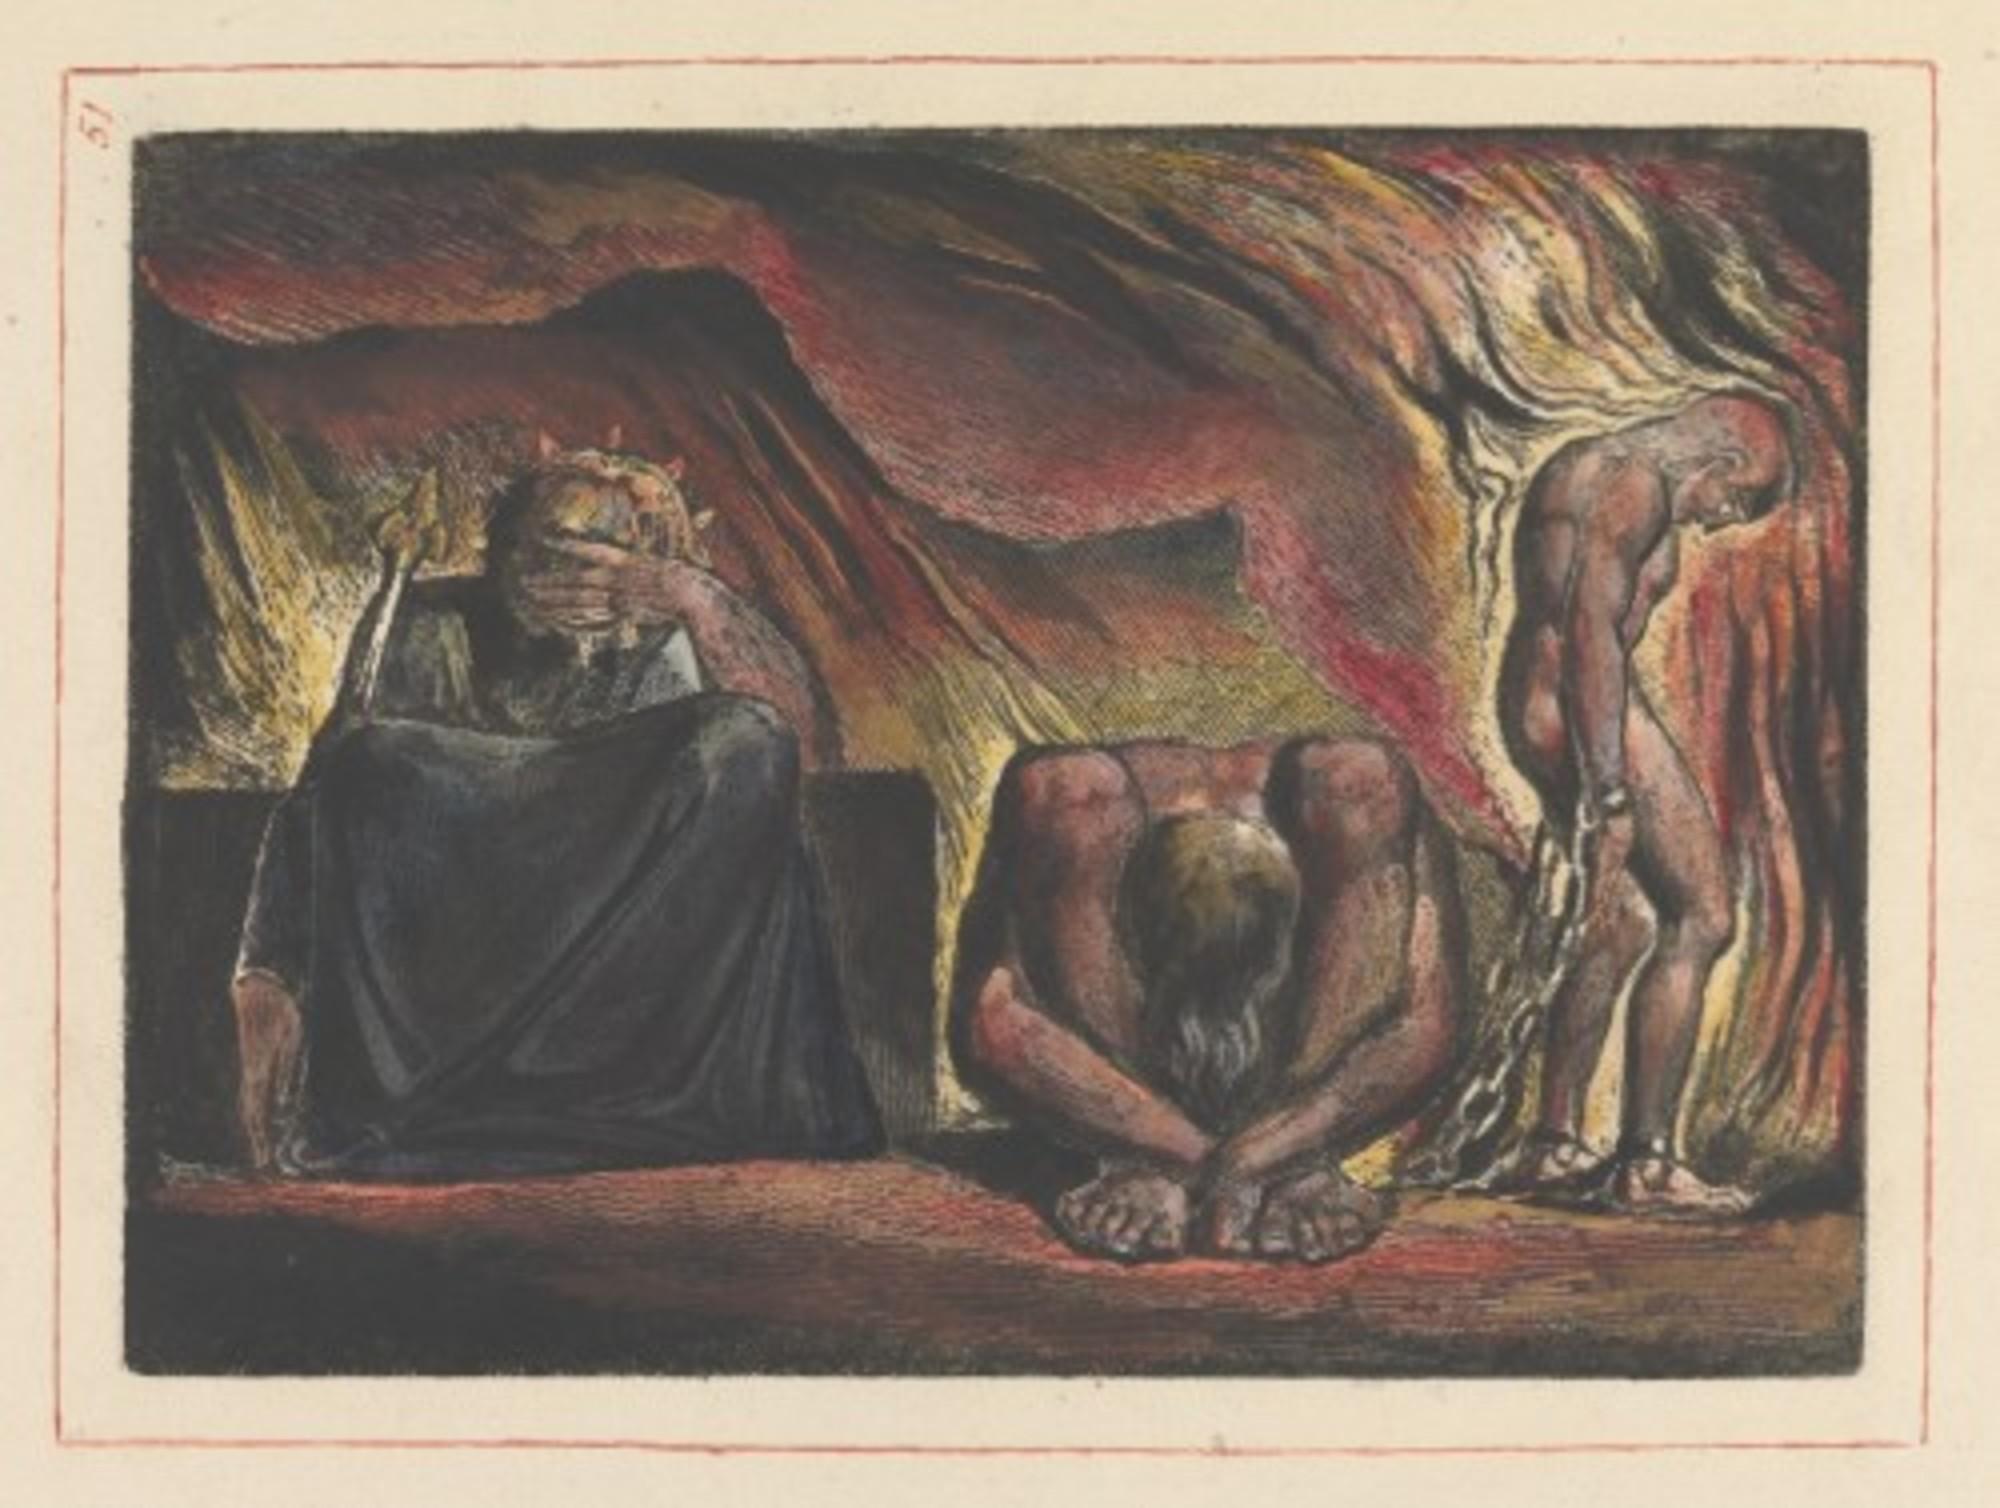 William_Blake_-_Jerusalem_Plate_51_-_Google_Art_Project.jpg